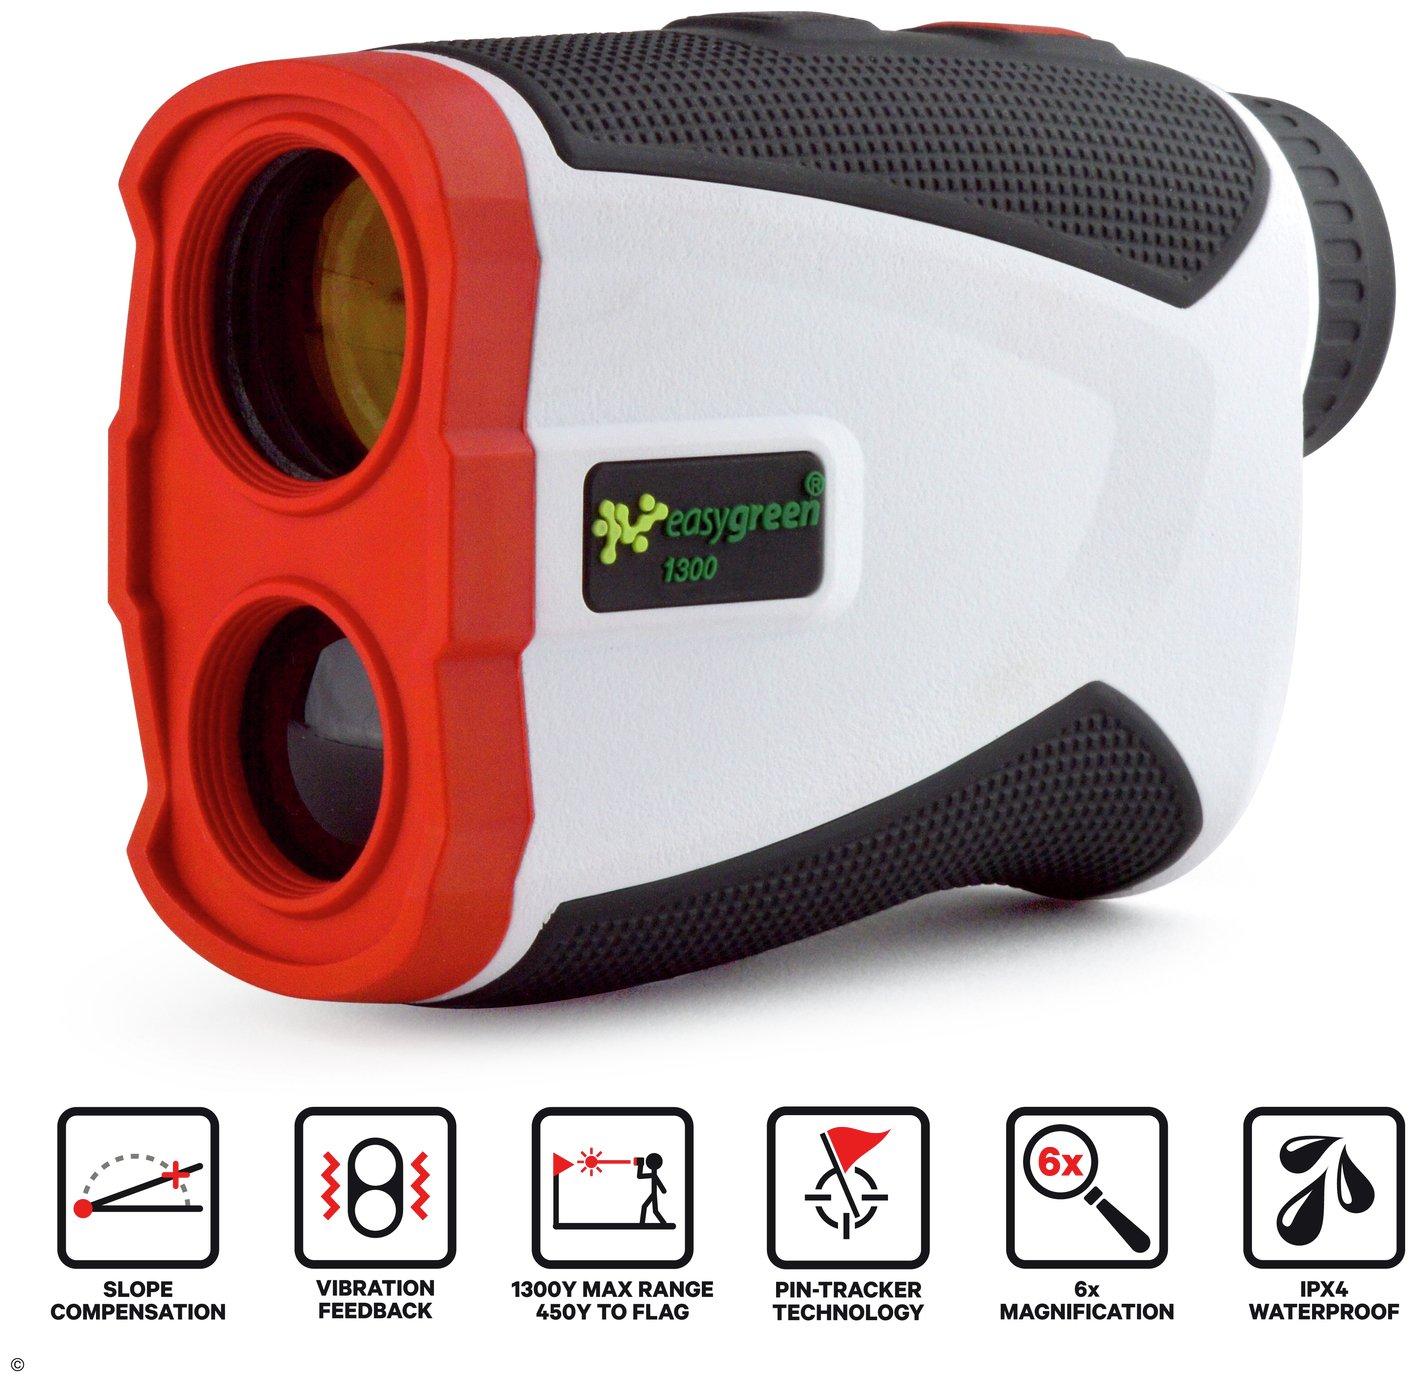 Easygreen 1300 Laser Golf Rangefinder